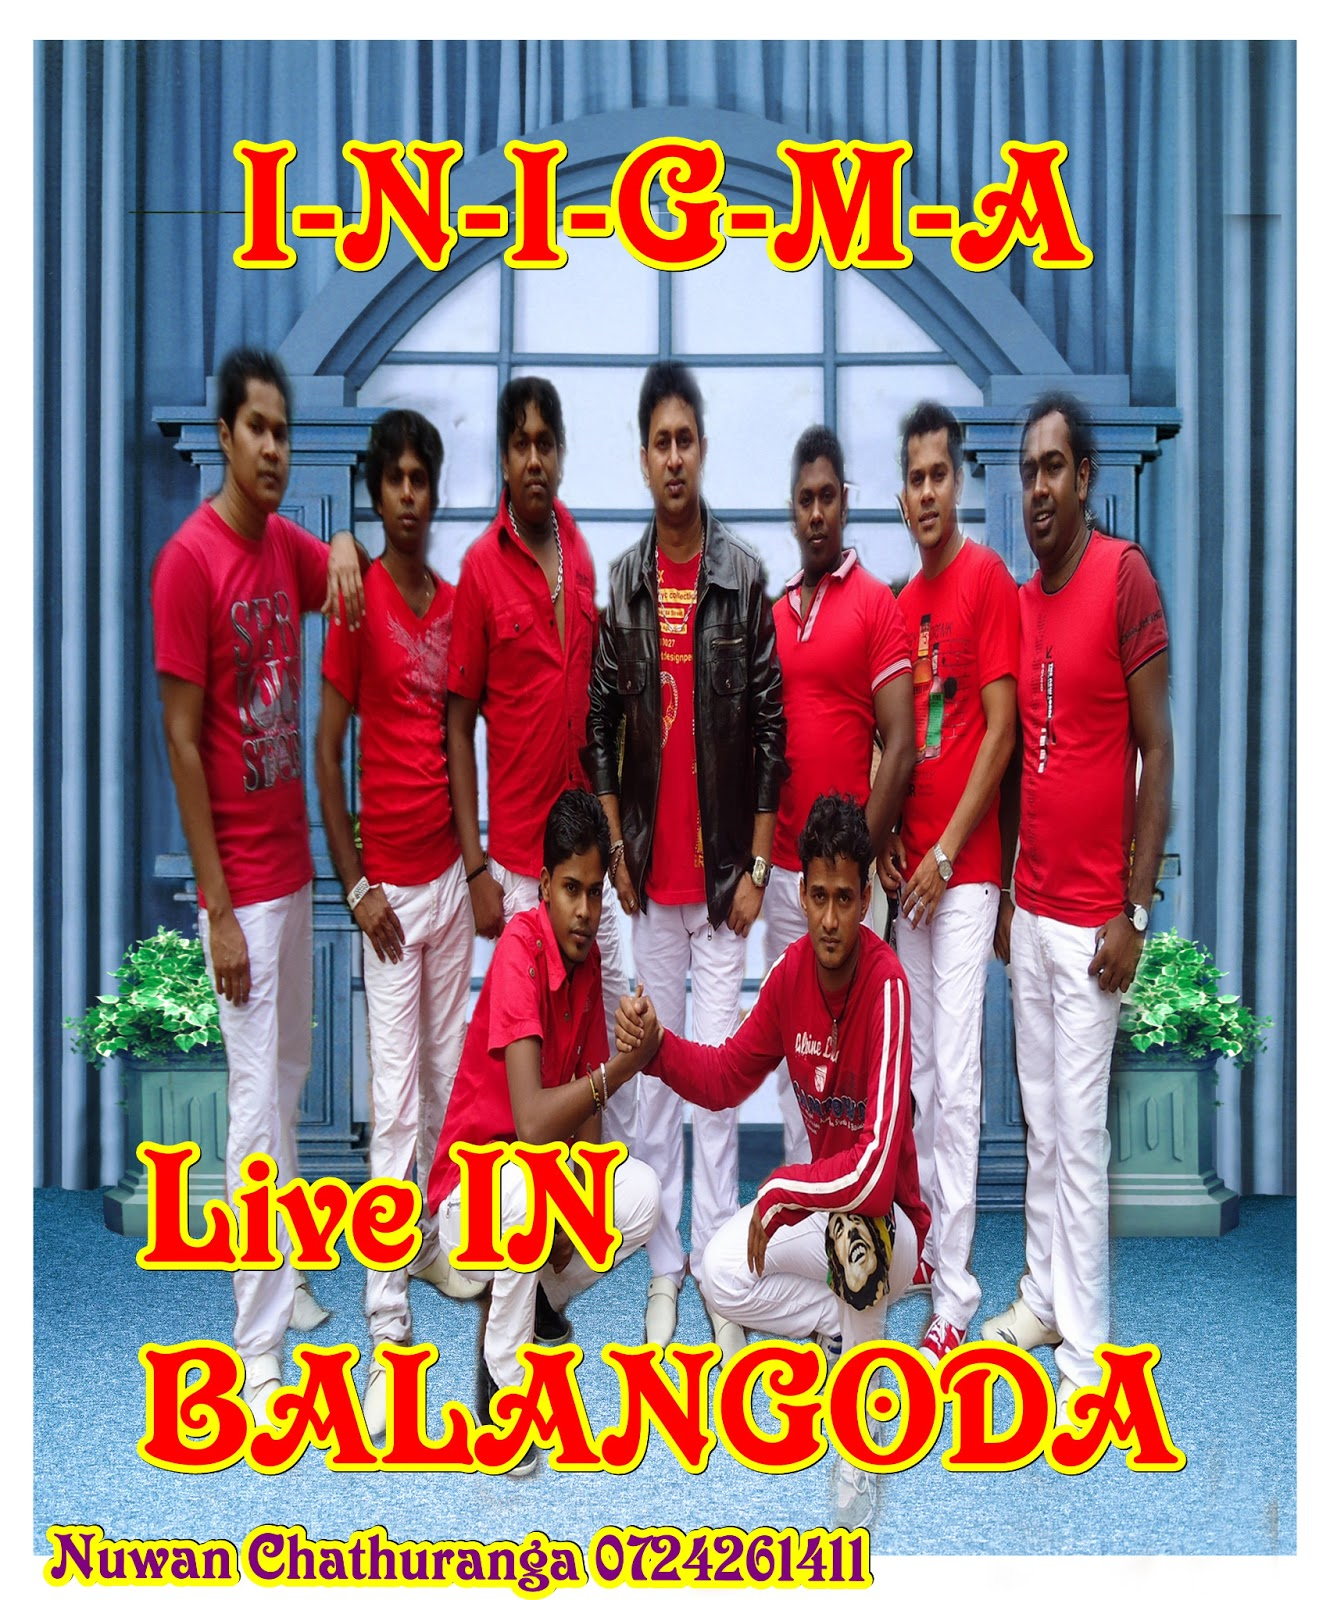 http://1.bp.blogspot.com/-J3JyHOzNtF8/URi-NOxisqI/AAAAAAAAIbo/ZQAhV-Vnre4/s1600/INIGMA.jpg